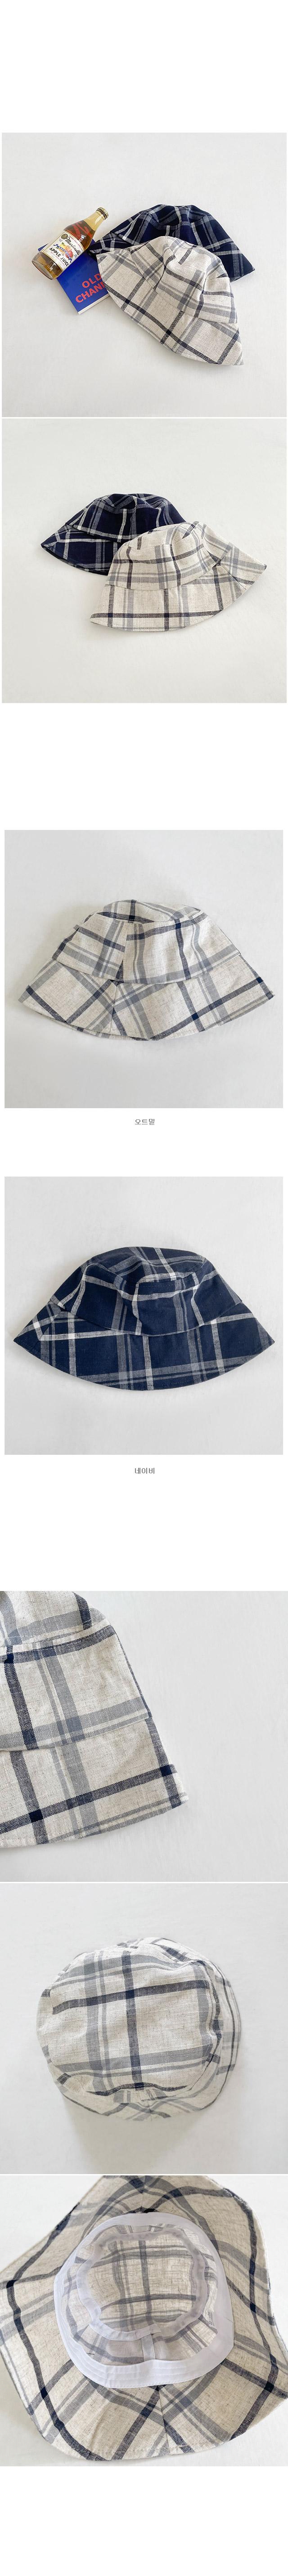 Teeth Check Linen Bucket Hat - Oatmeal